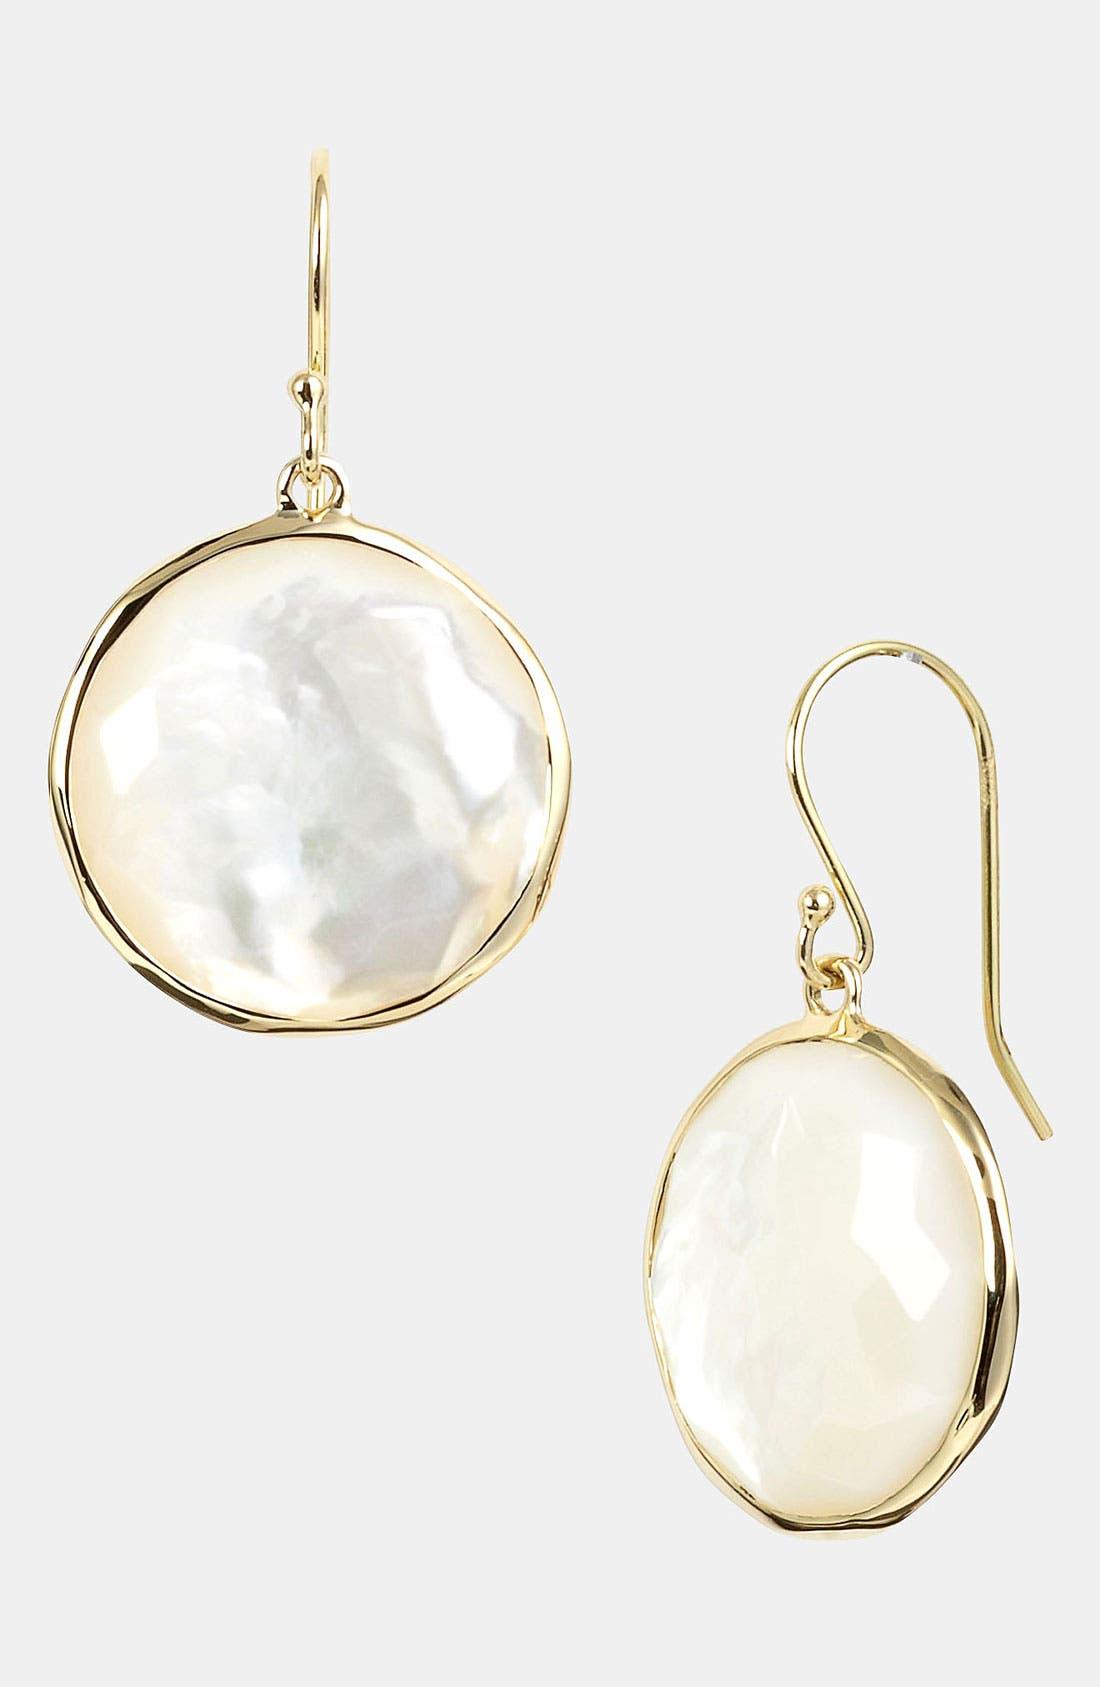 Alternate Image 1 Selected - Ippolita 'Rock Candy - Lollipop' 18k Gold Drop Earrings